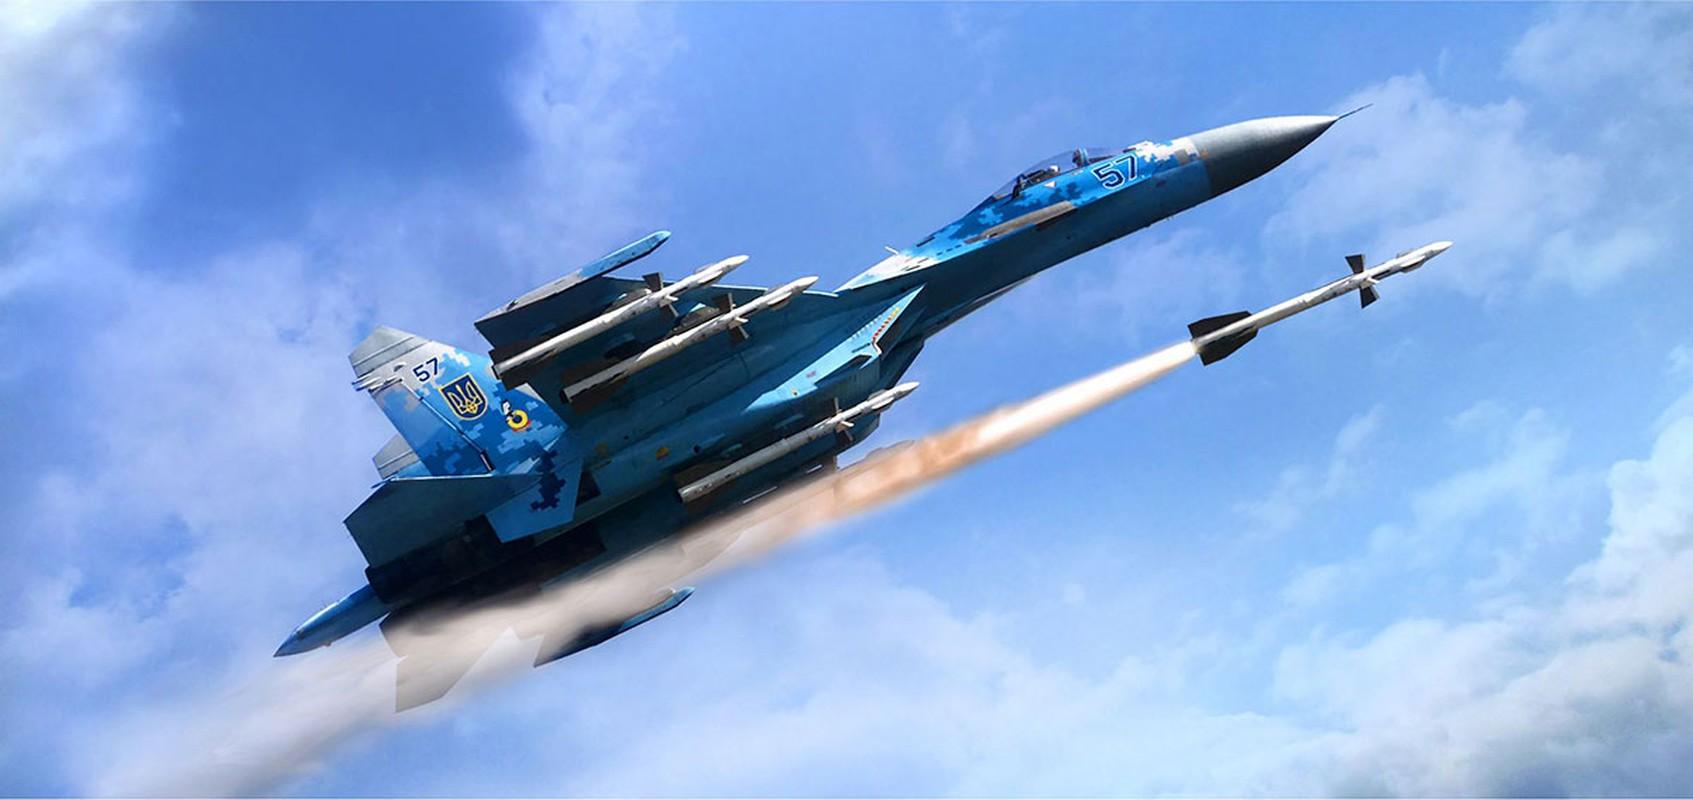 Tiem kich Su-27 va F-15 doi dau, dau la ke vo dich?-Hinh-13